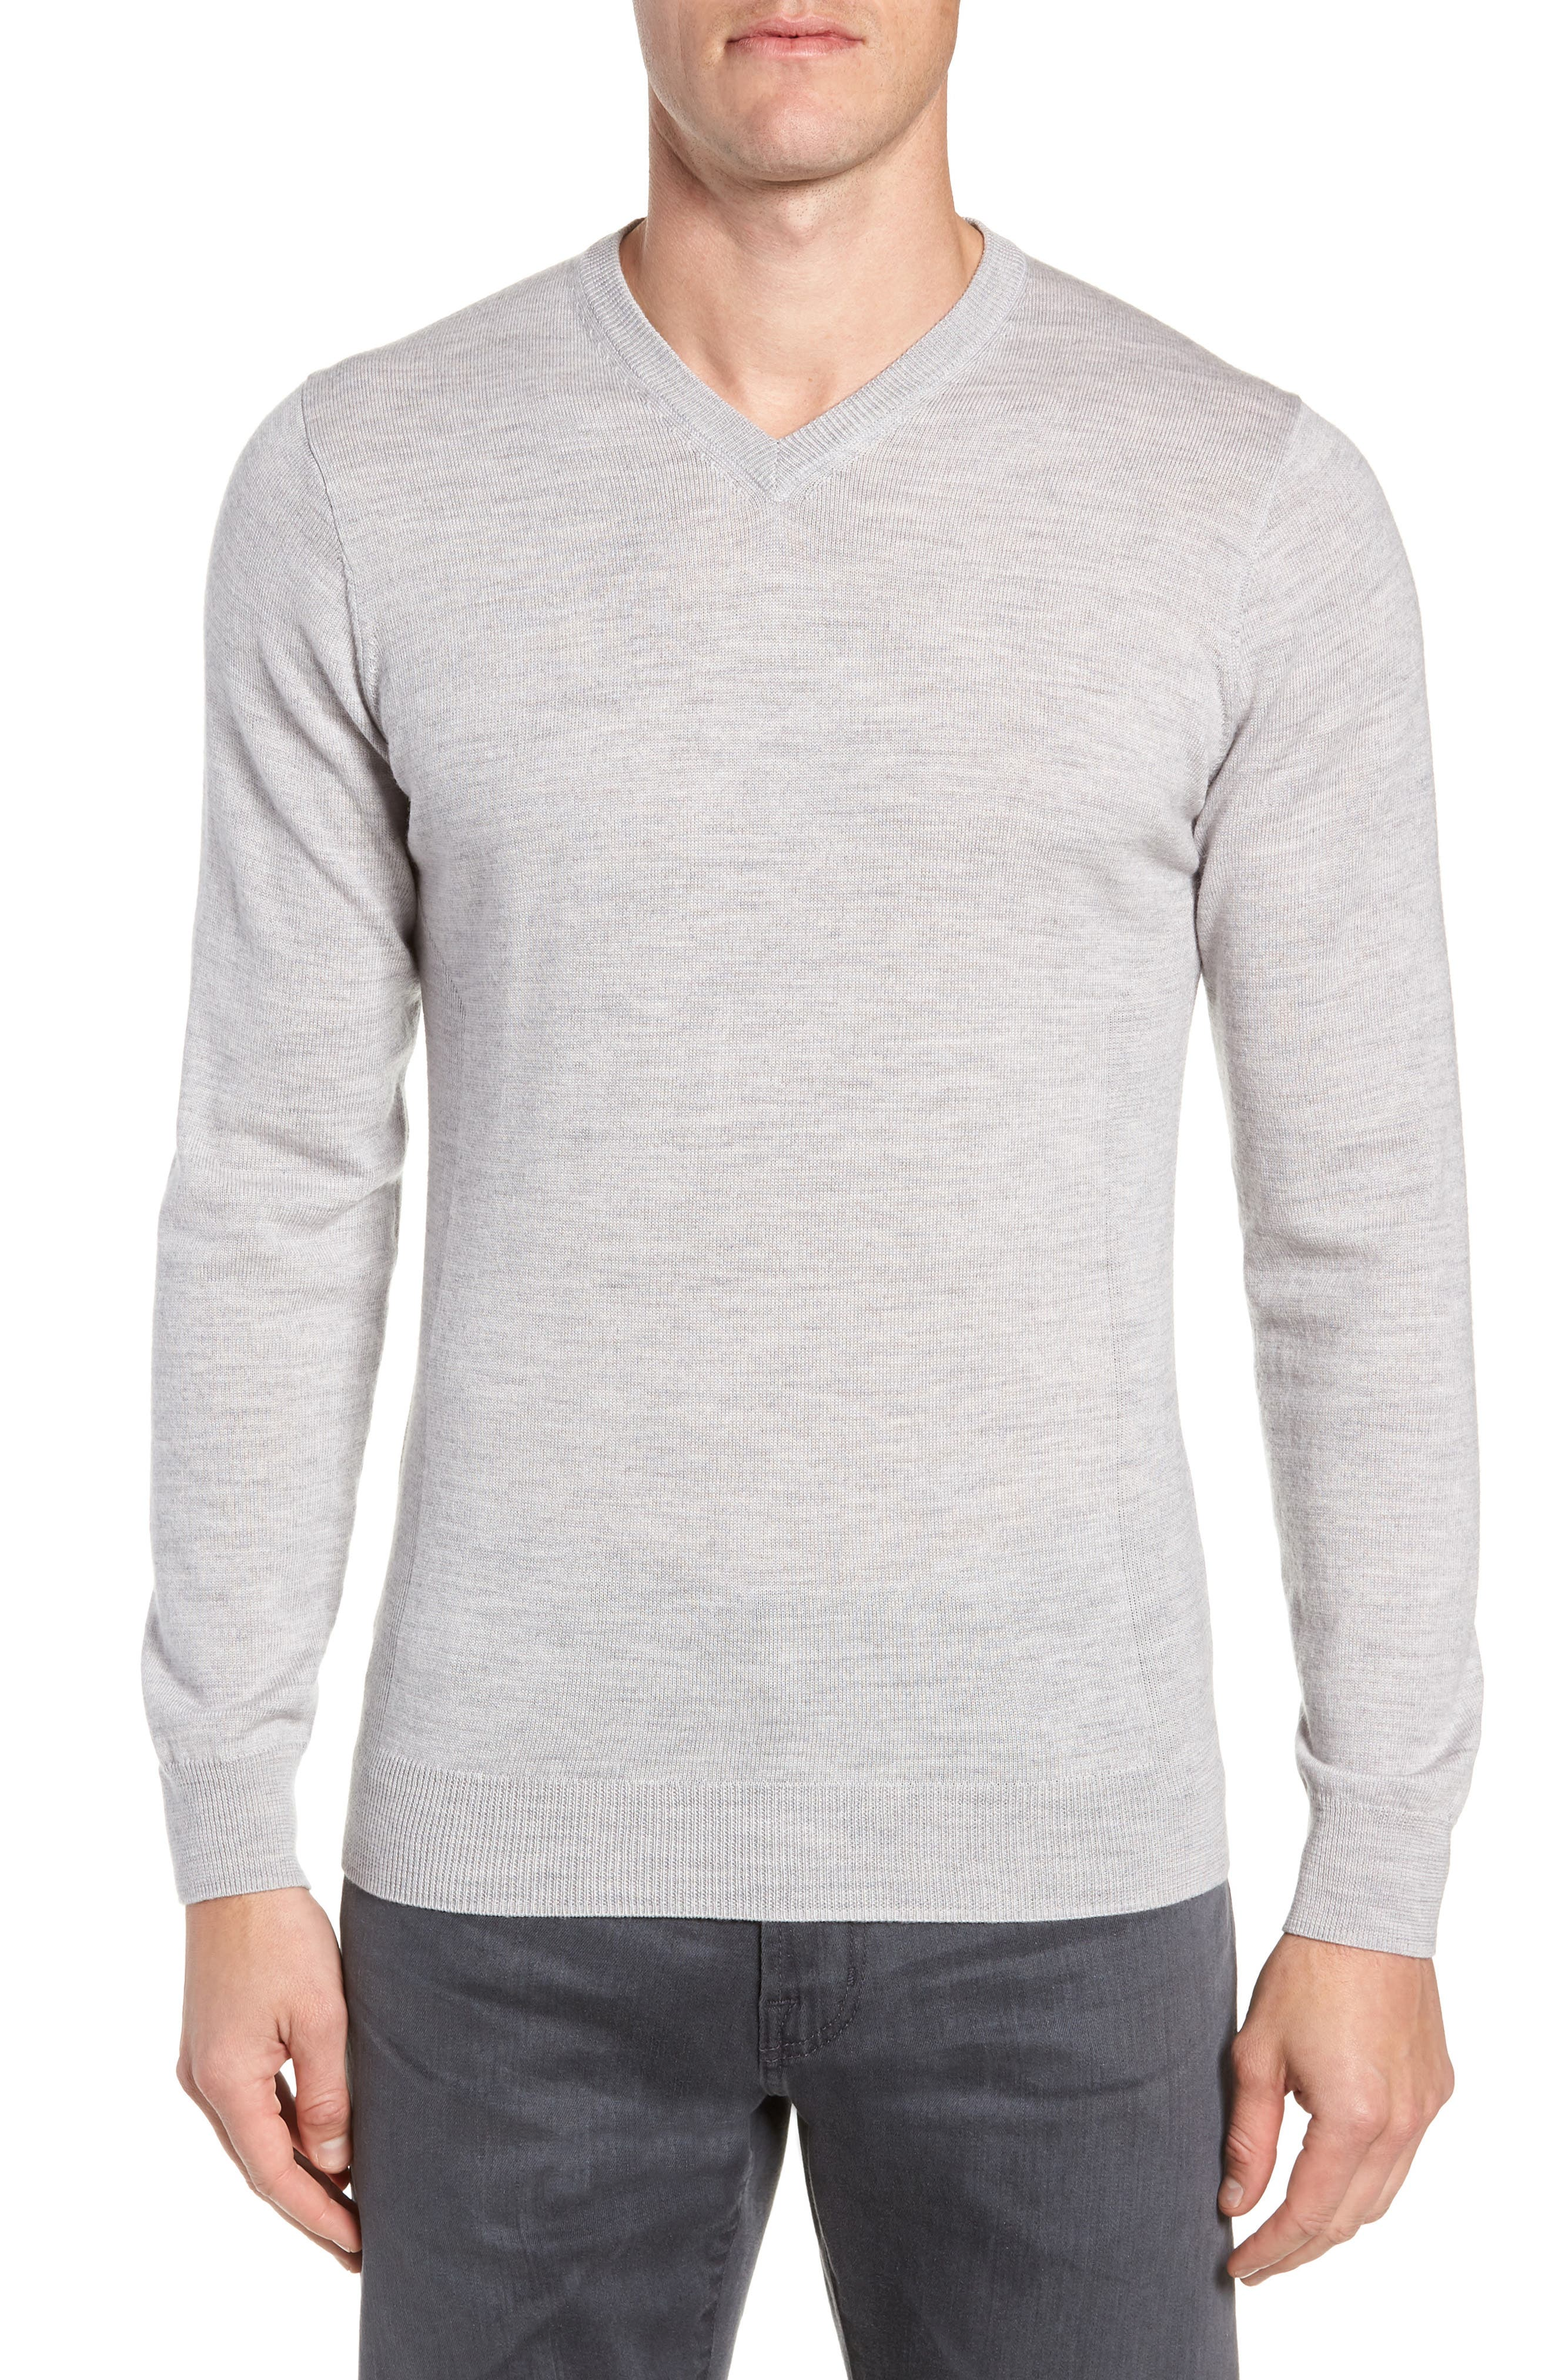 Icebreaker Shearer V-Neck Merino Sweater, Grey